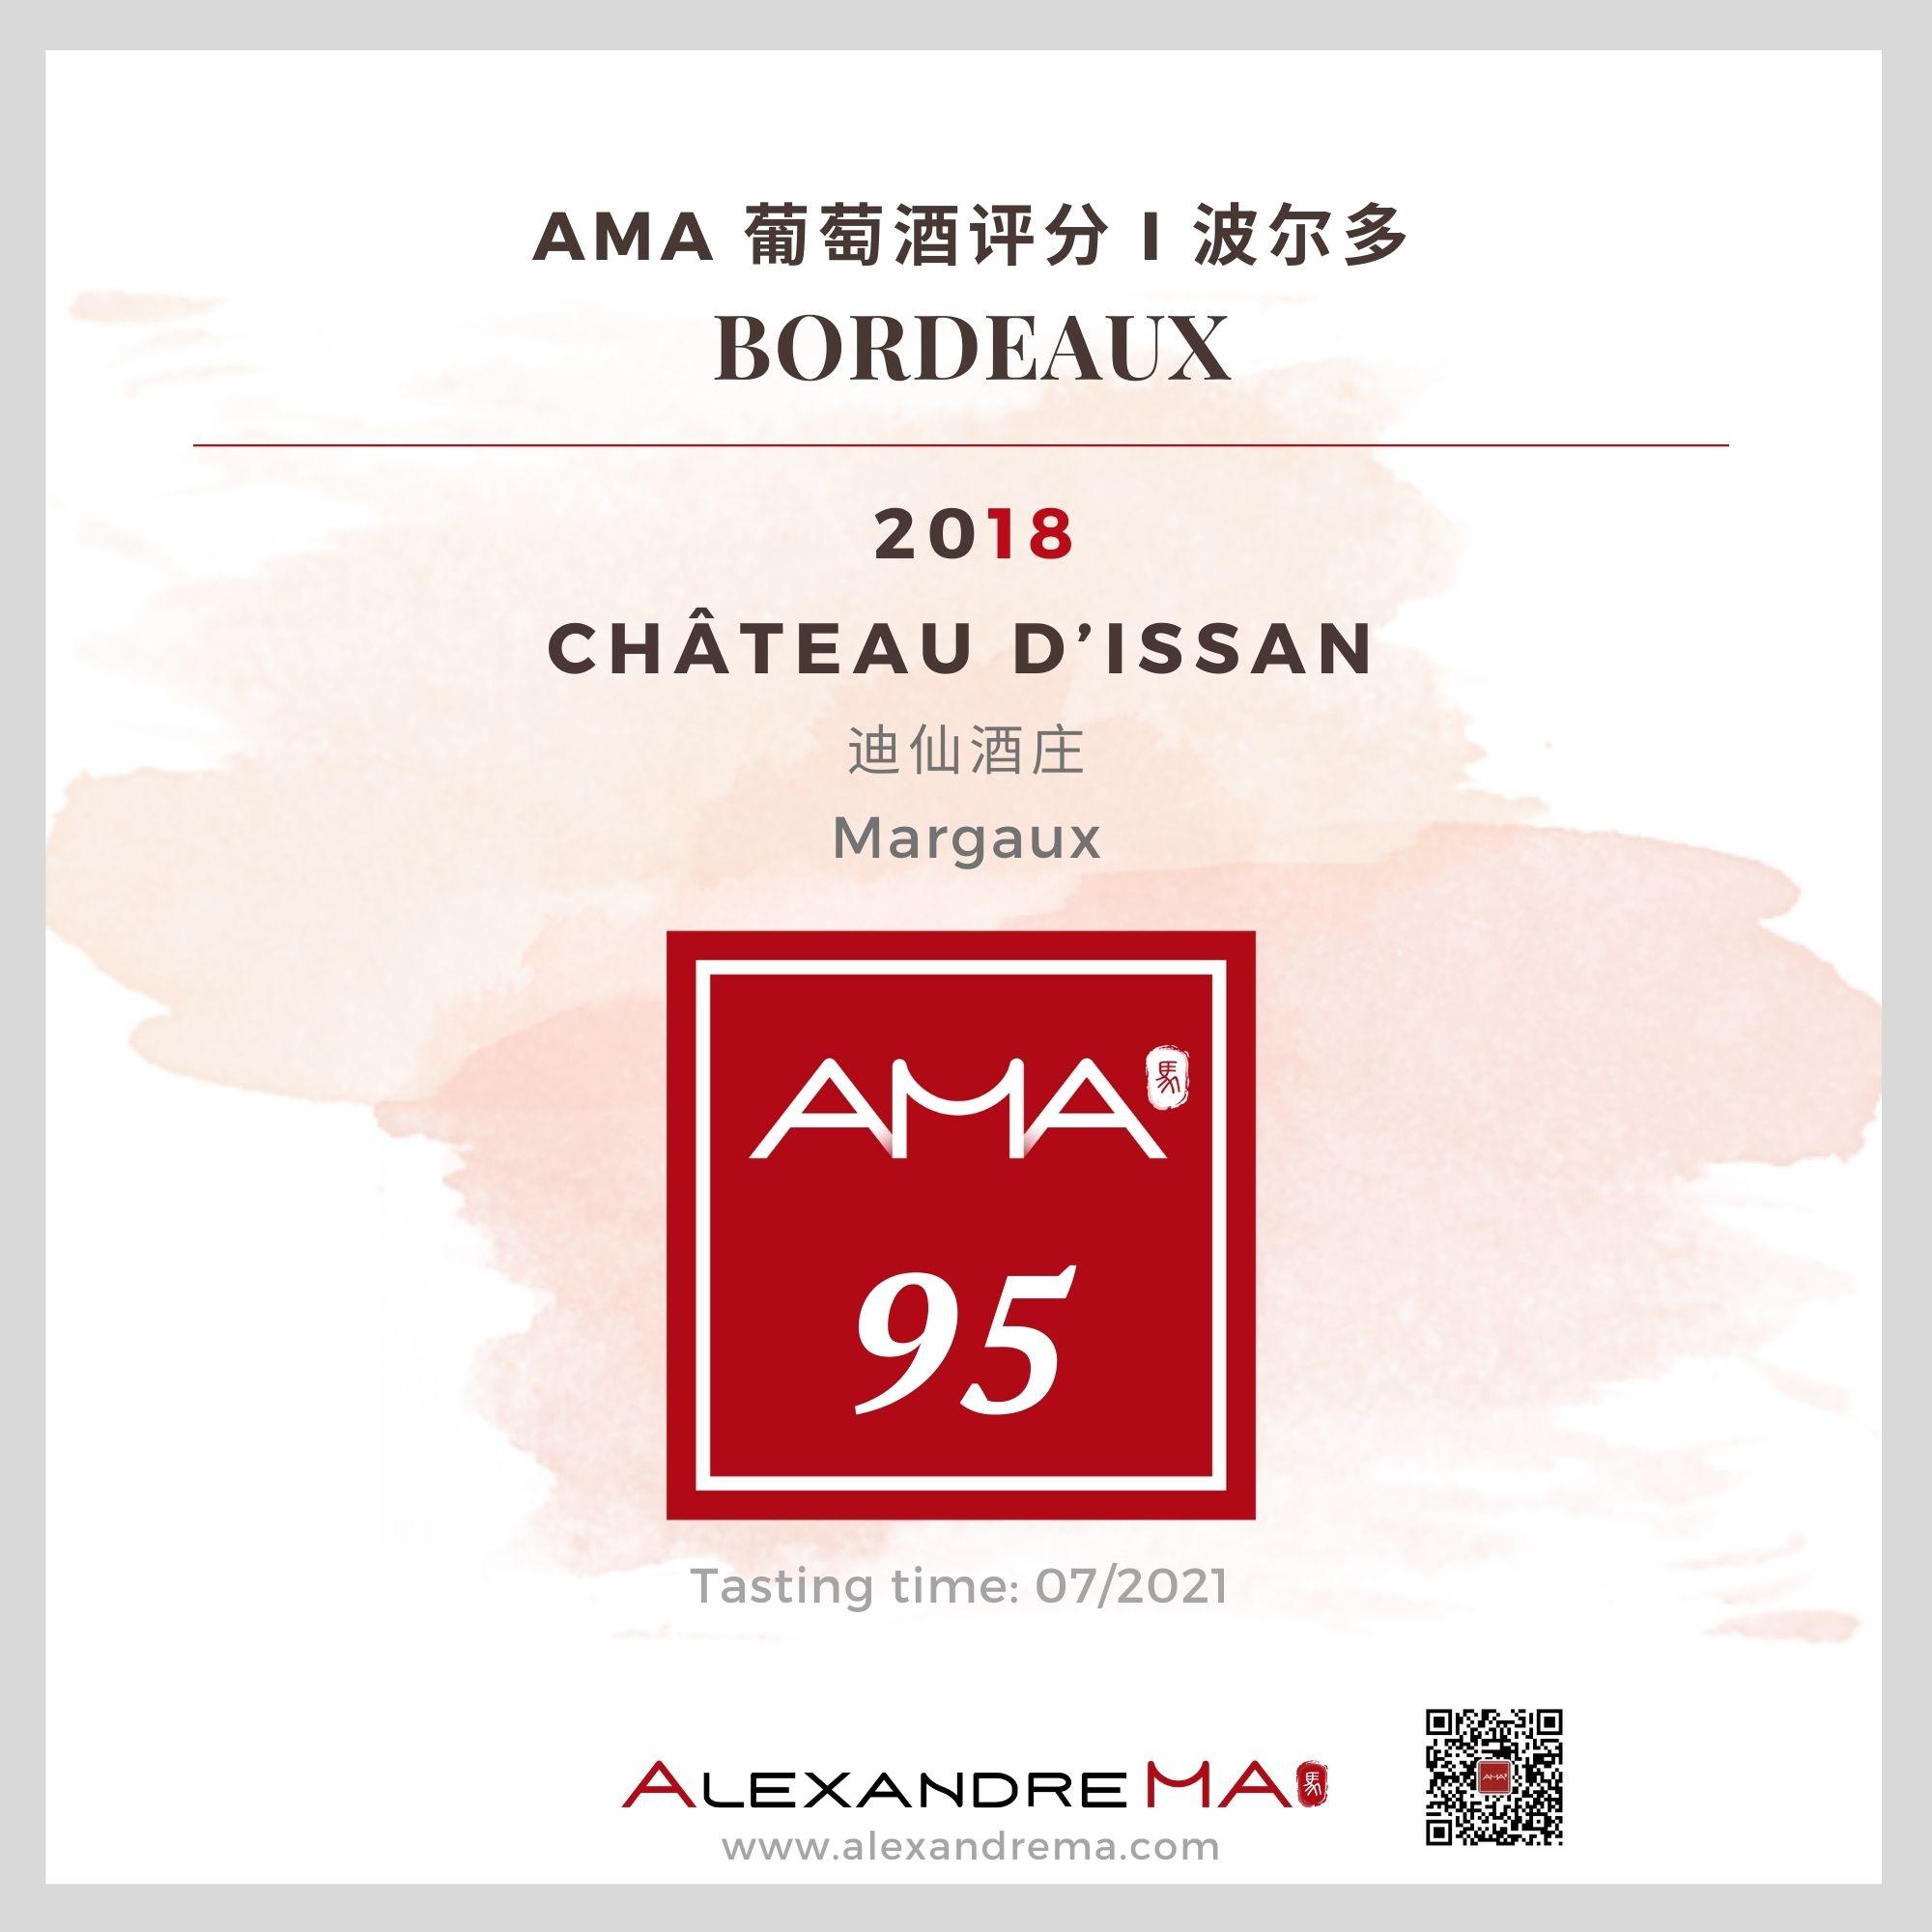 Château d'Issan 2018 迪仙酒庄 - Alexandre Ma